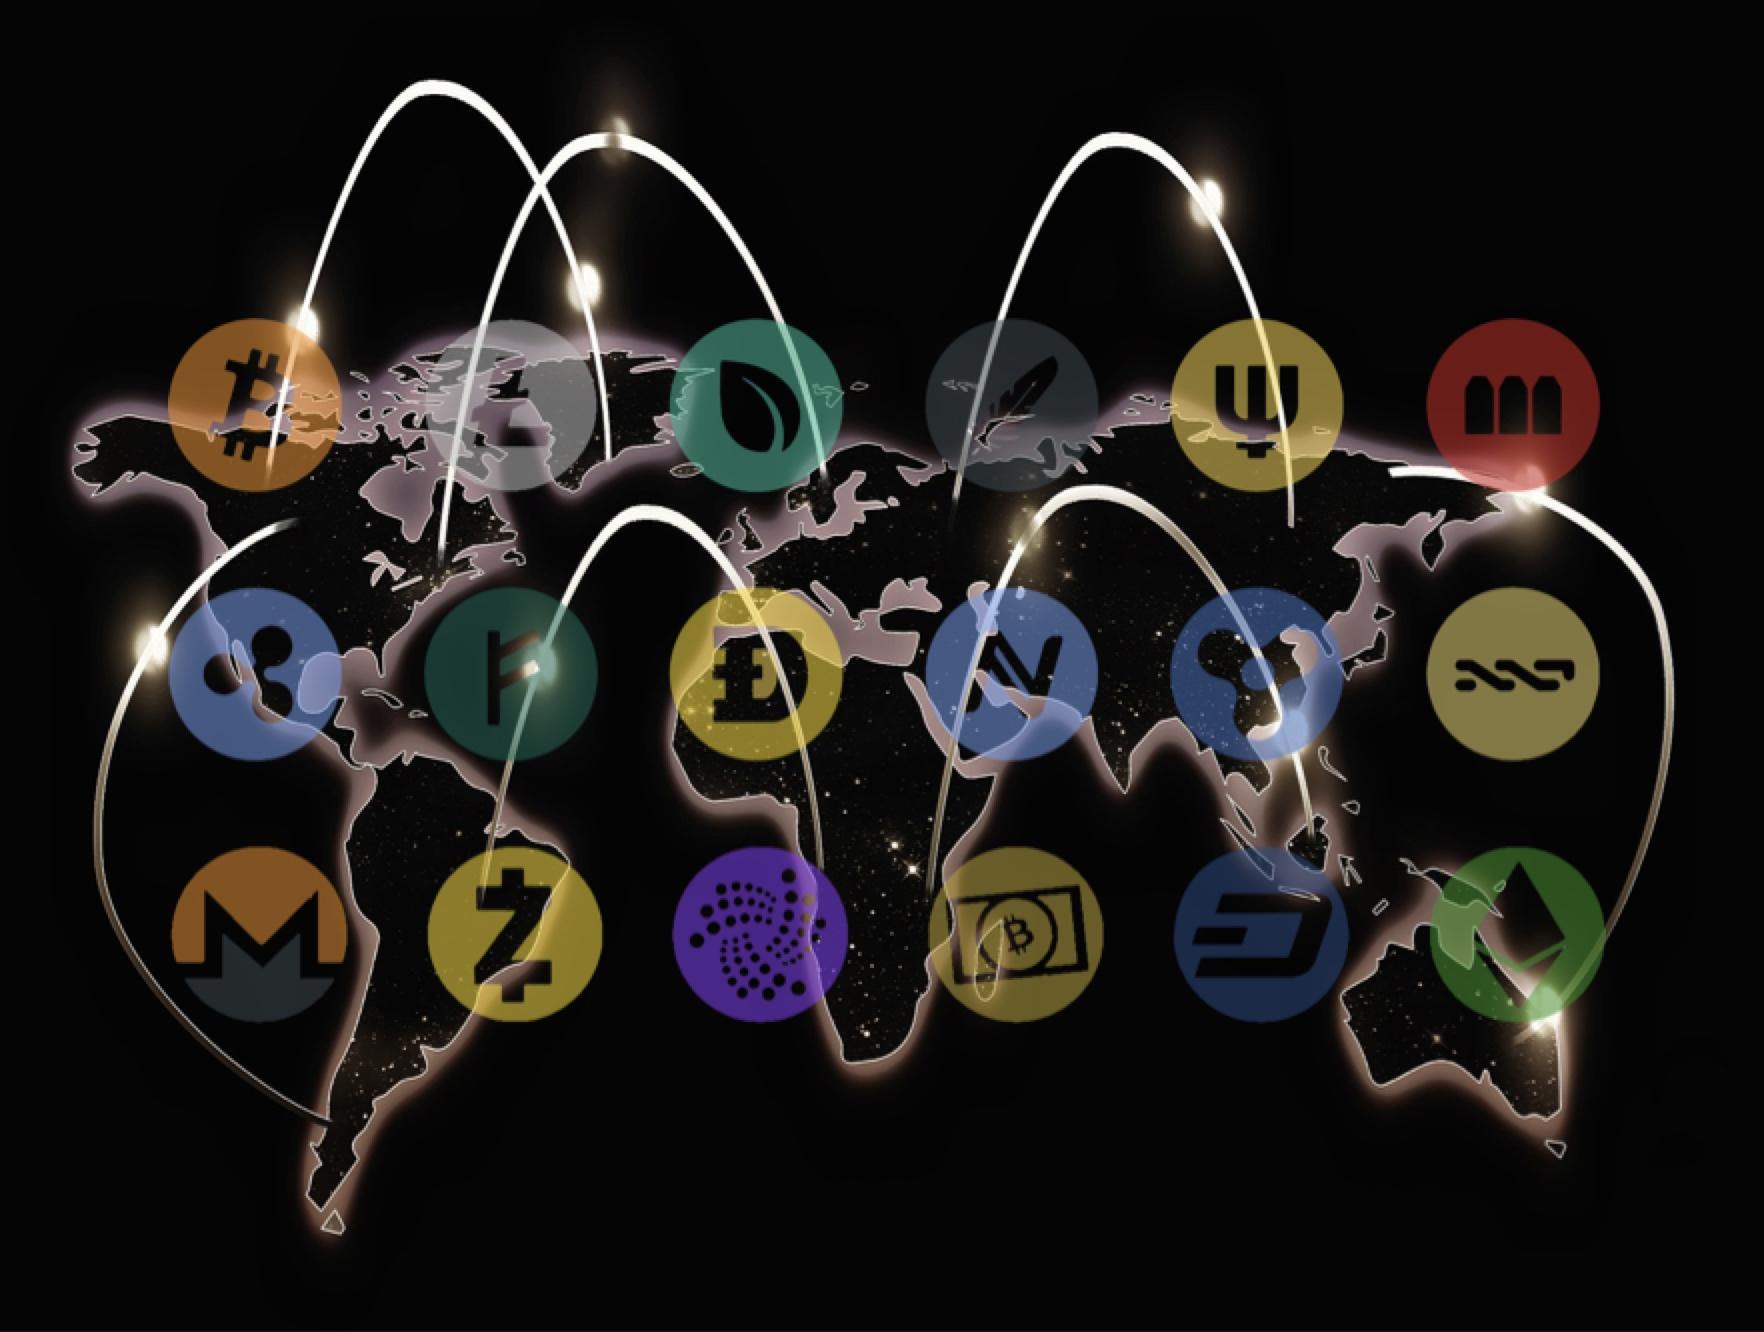 aml emerging methodology cryptocurrency